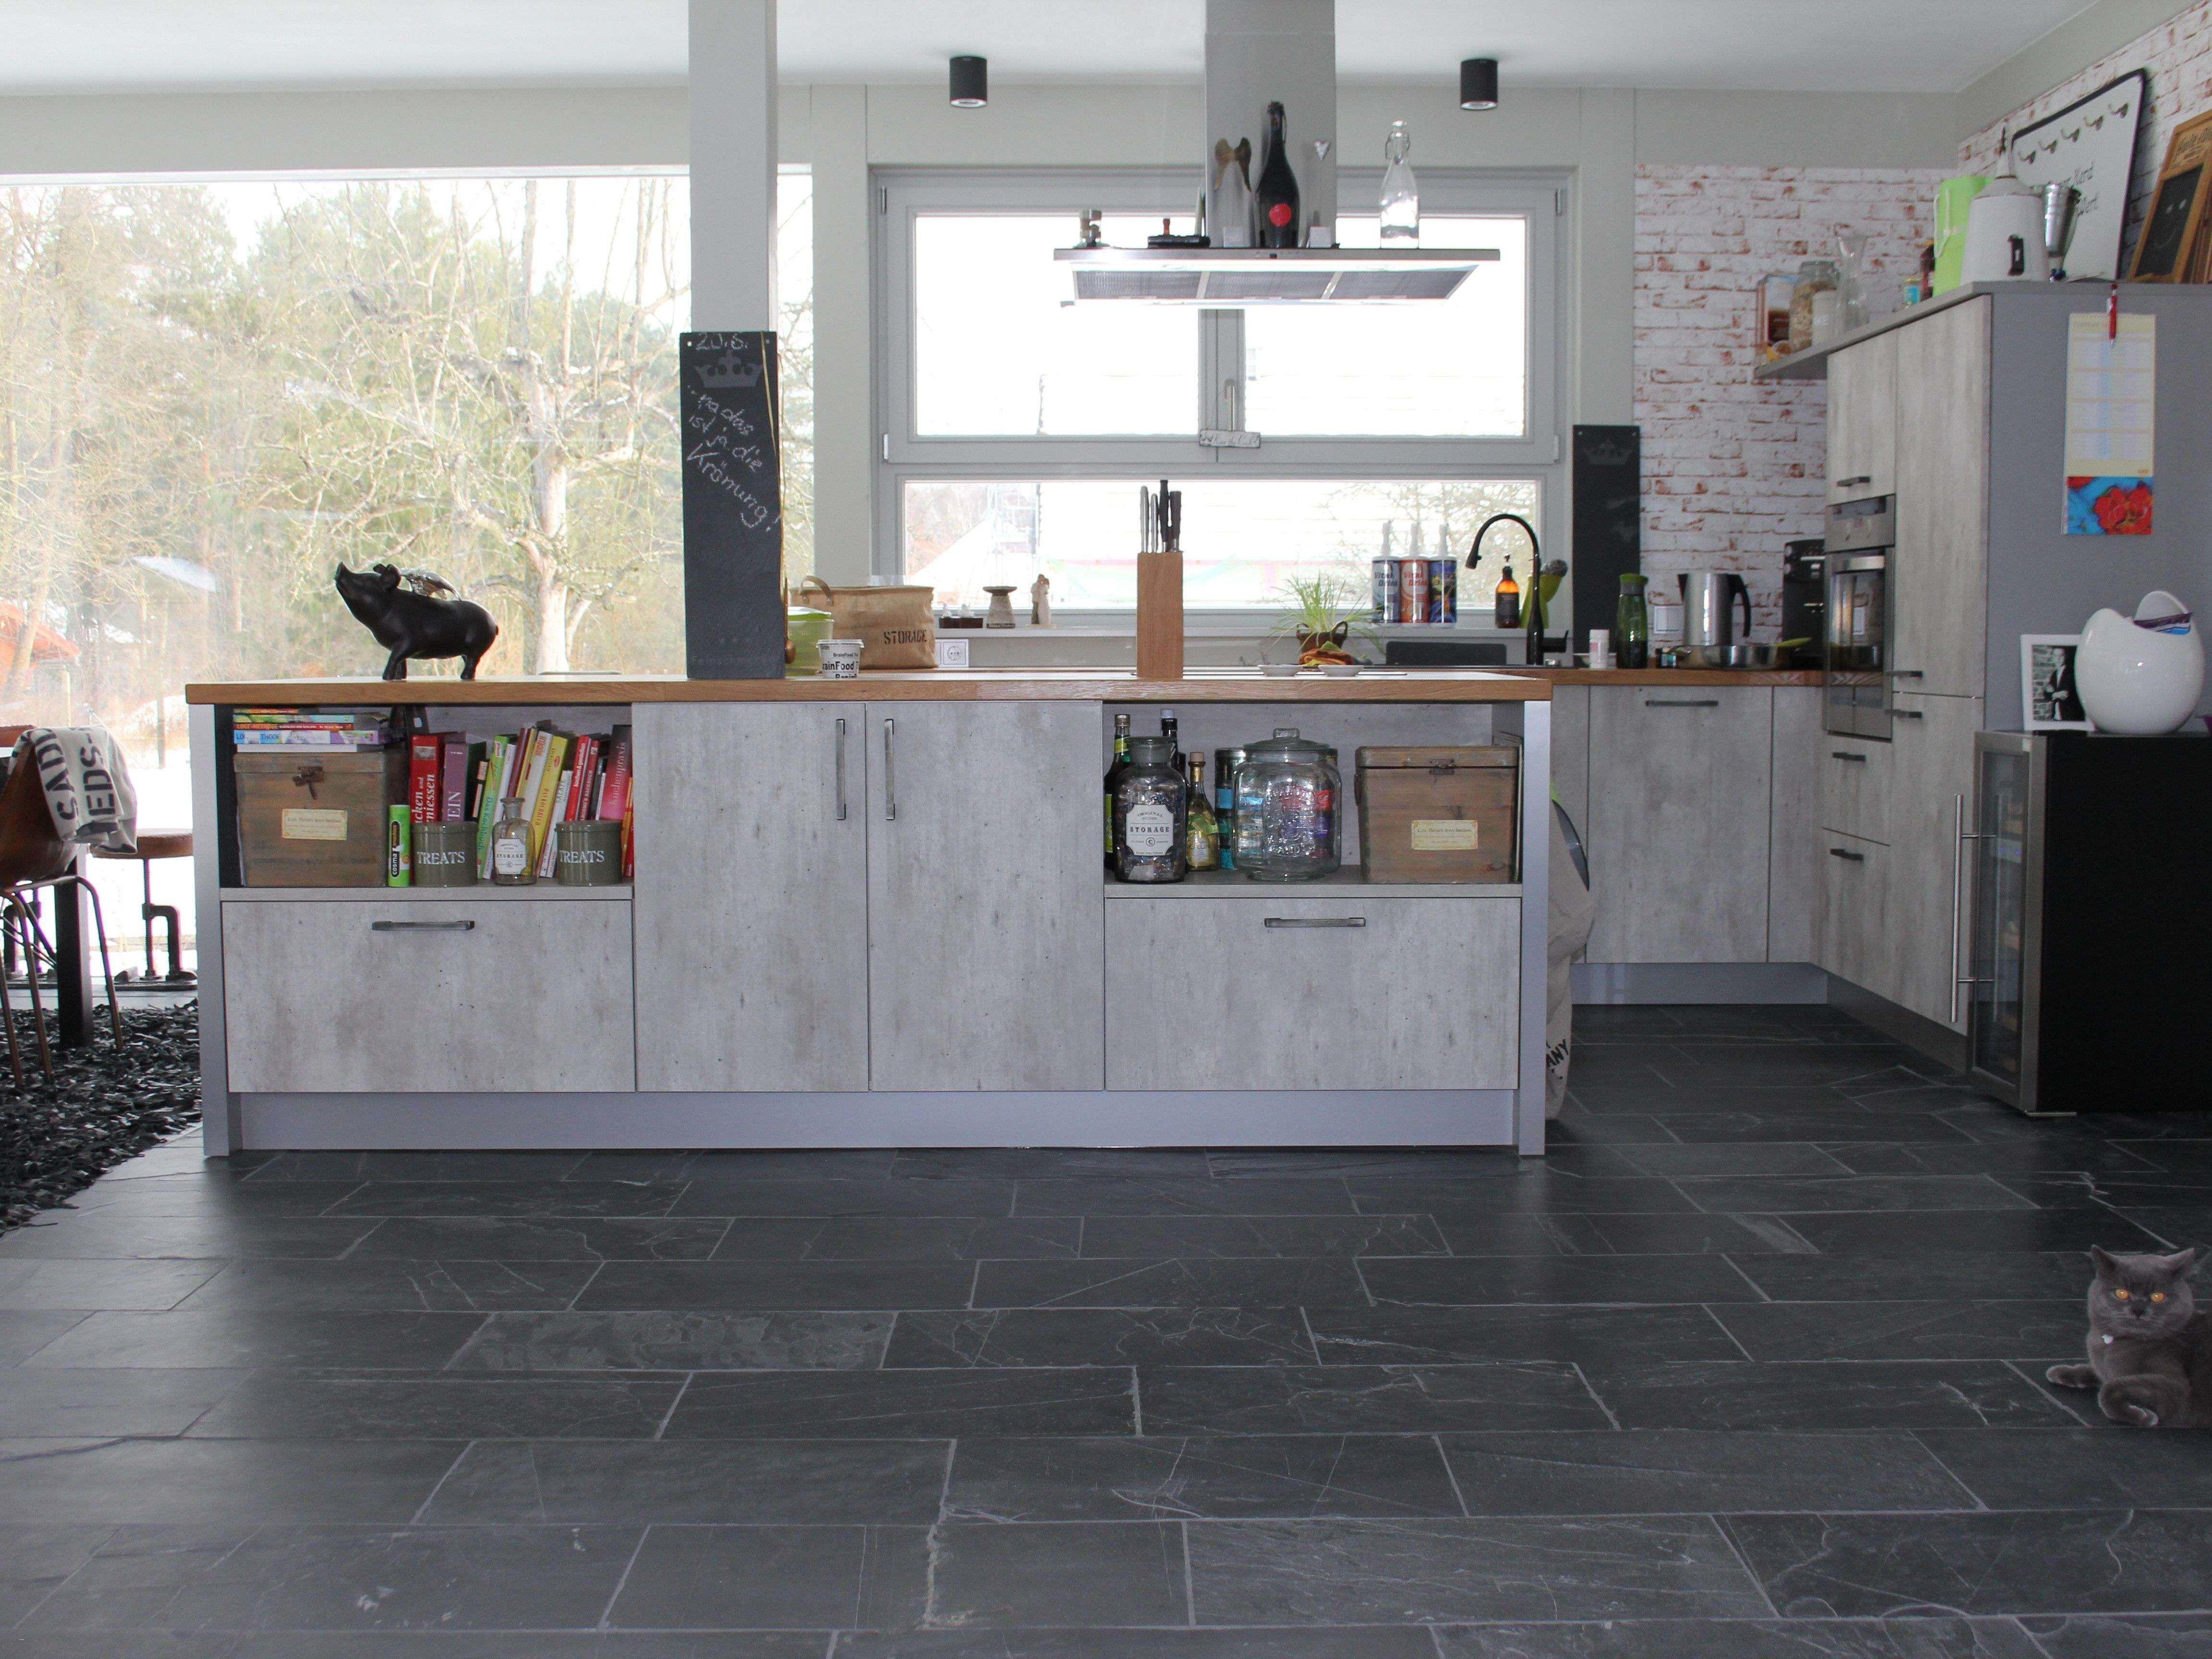 35 Neu Outdoor Kuche Ytong Kitchen In 2018 Pinterest Tiles